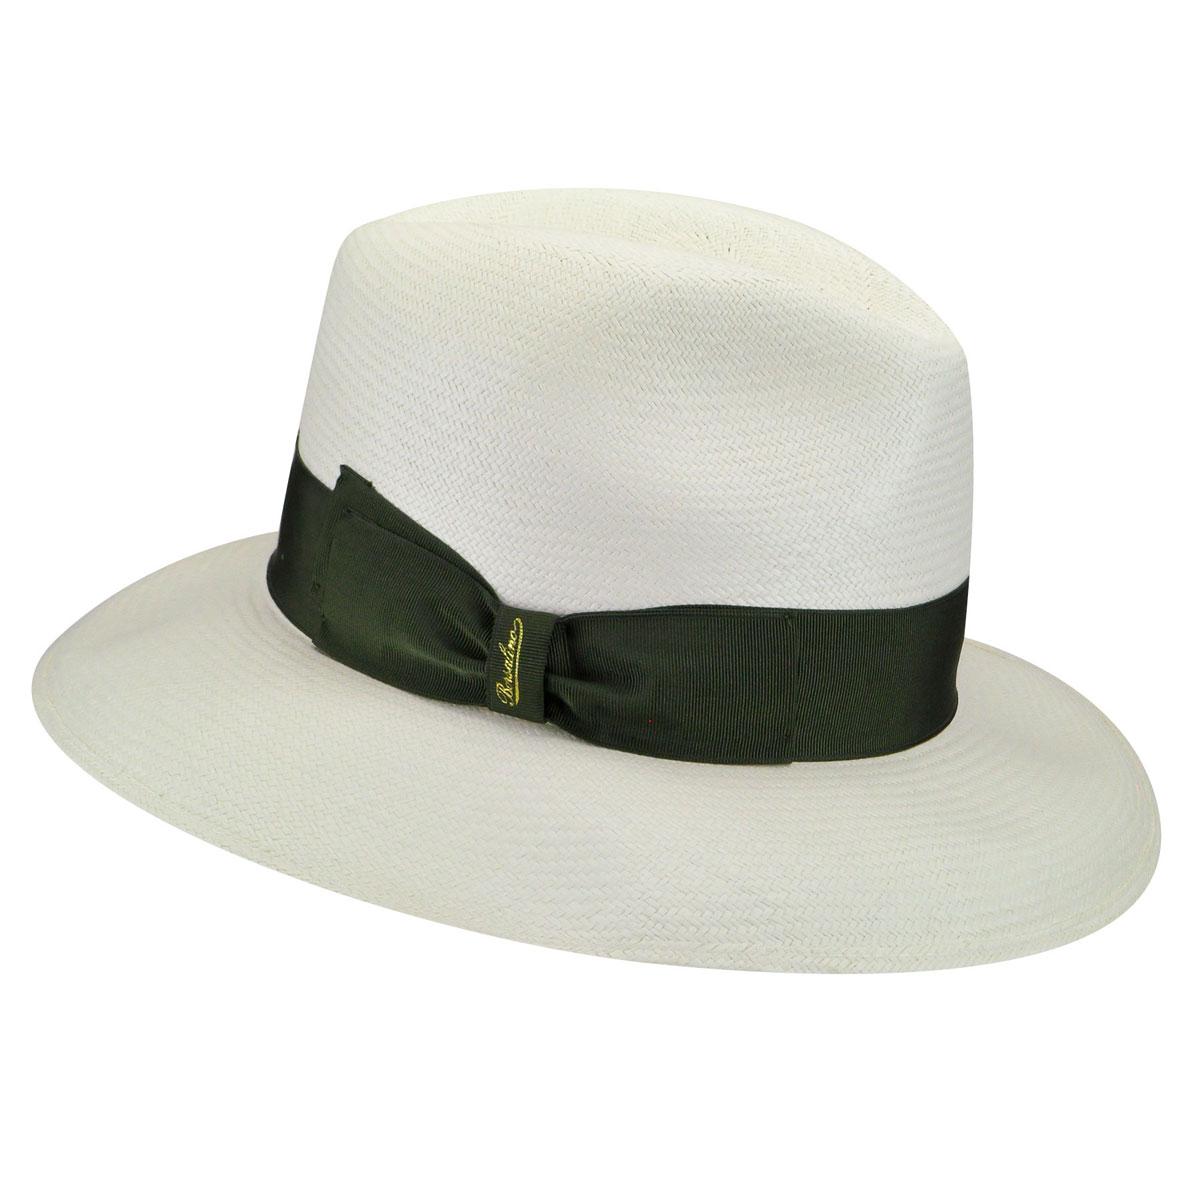 1930s Style Mens Hats 232044 Tesa Larga Fine Panama Fedora $355.00 AT vintagedancer.com